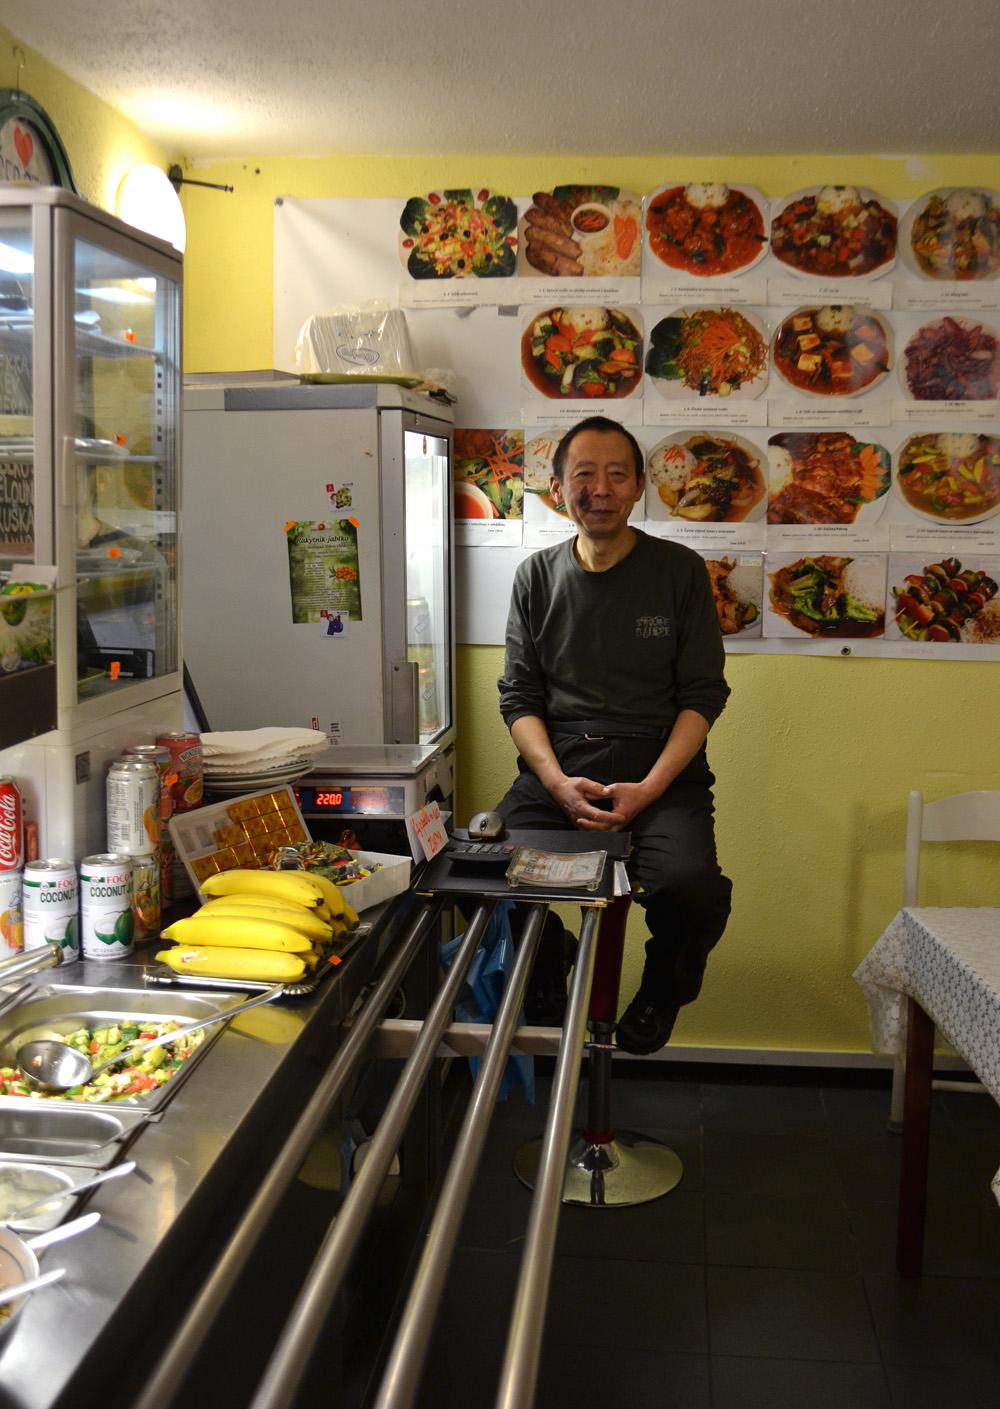 Jian Guo Chen ve své veganské restauraci Vegetka. Foto: Barbora Šajmovičová, 2016, Vegetka, Praha.